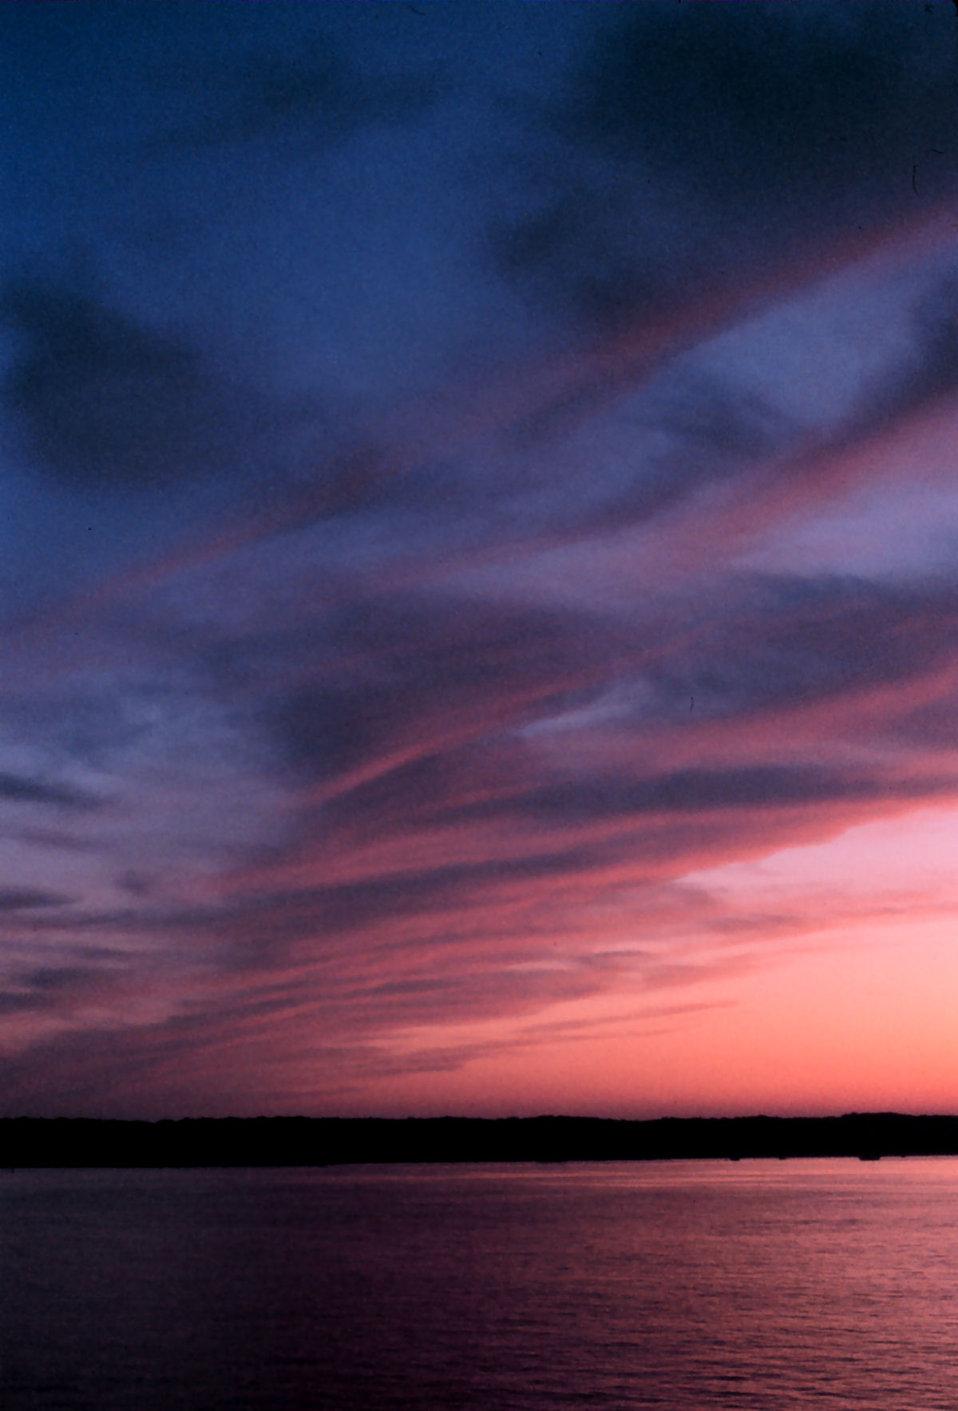 Sunset at sea south of Nantucket